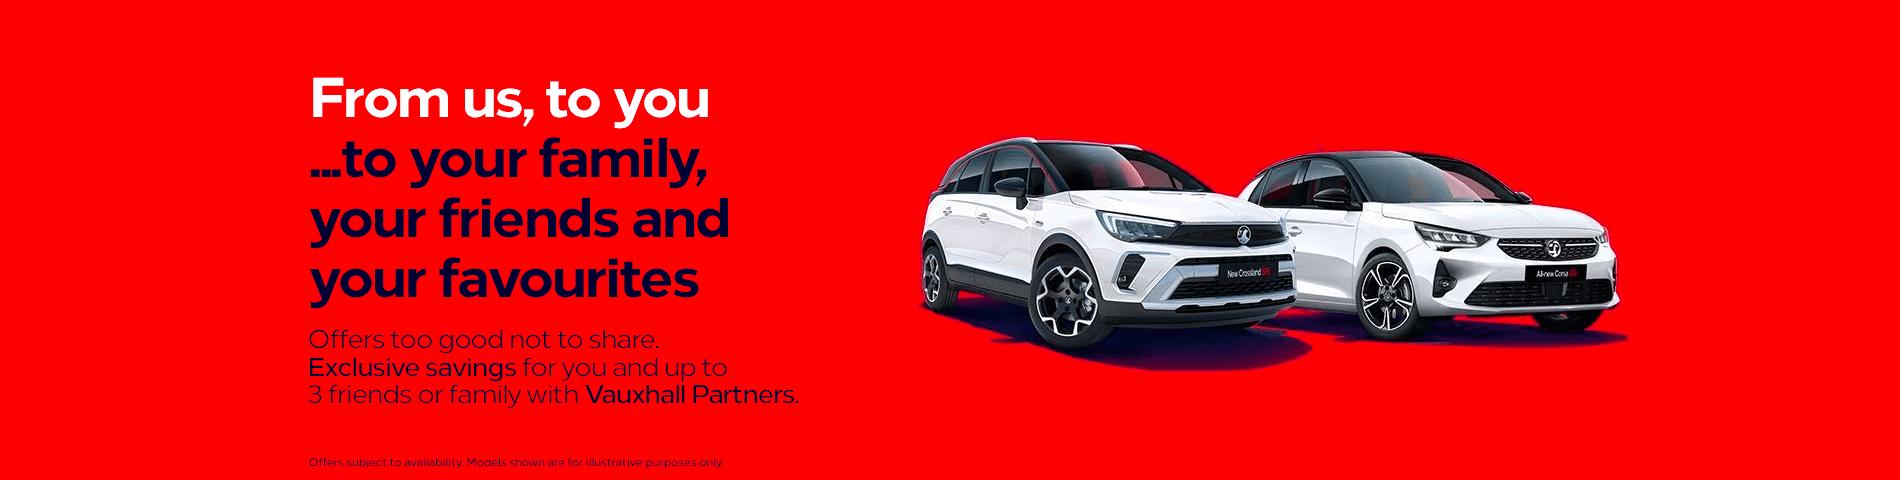 Vauxhall Partners